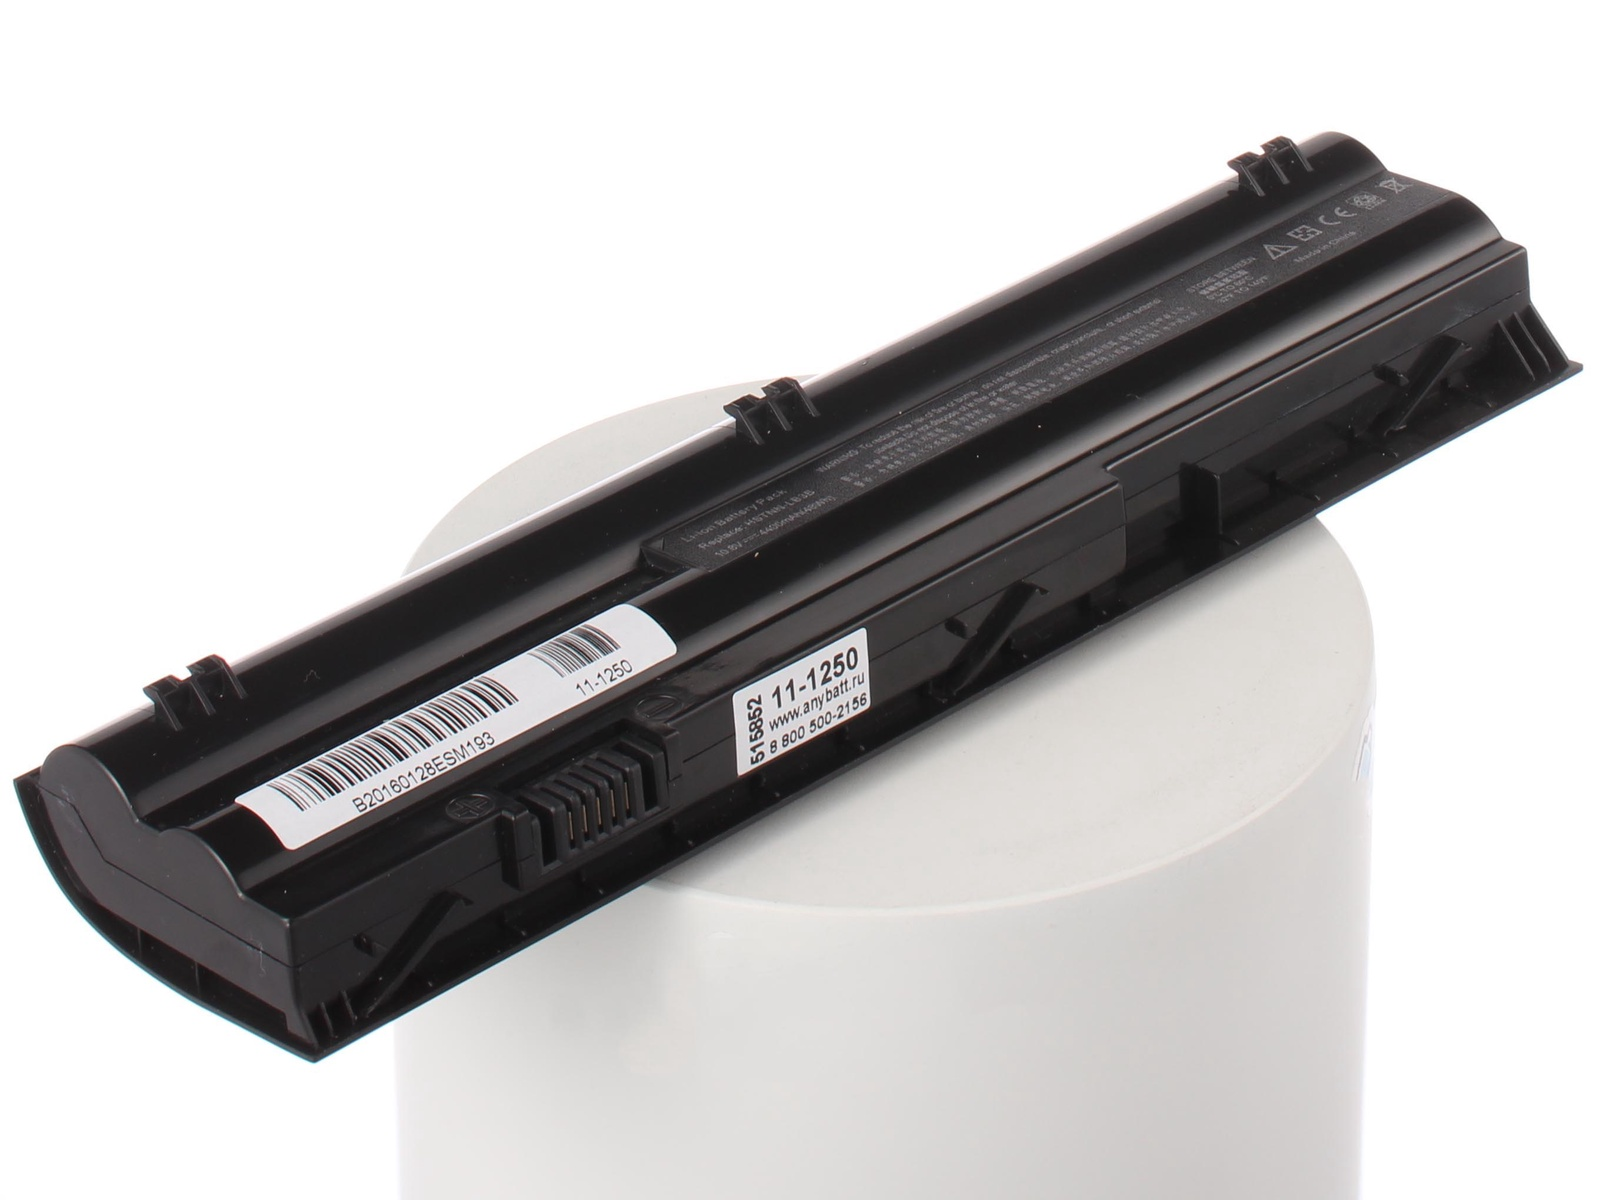 Аккумулятор для ноутбука AnyBatt для HP-Compaq Mini 210-3051er, Pavilion dm1-4000er, Mini 210-3052er, Mini 110-4101er, Pavilion dm1-4100er, Mini 210-3000er, Pavilion dm1-4001er, Mini 200-4251sr, Pavilion dm1-4300, Mini 210-3000 mini griptilian